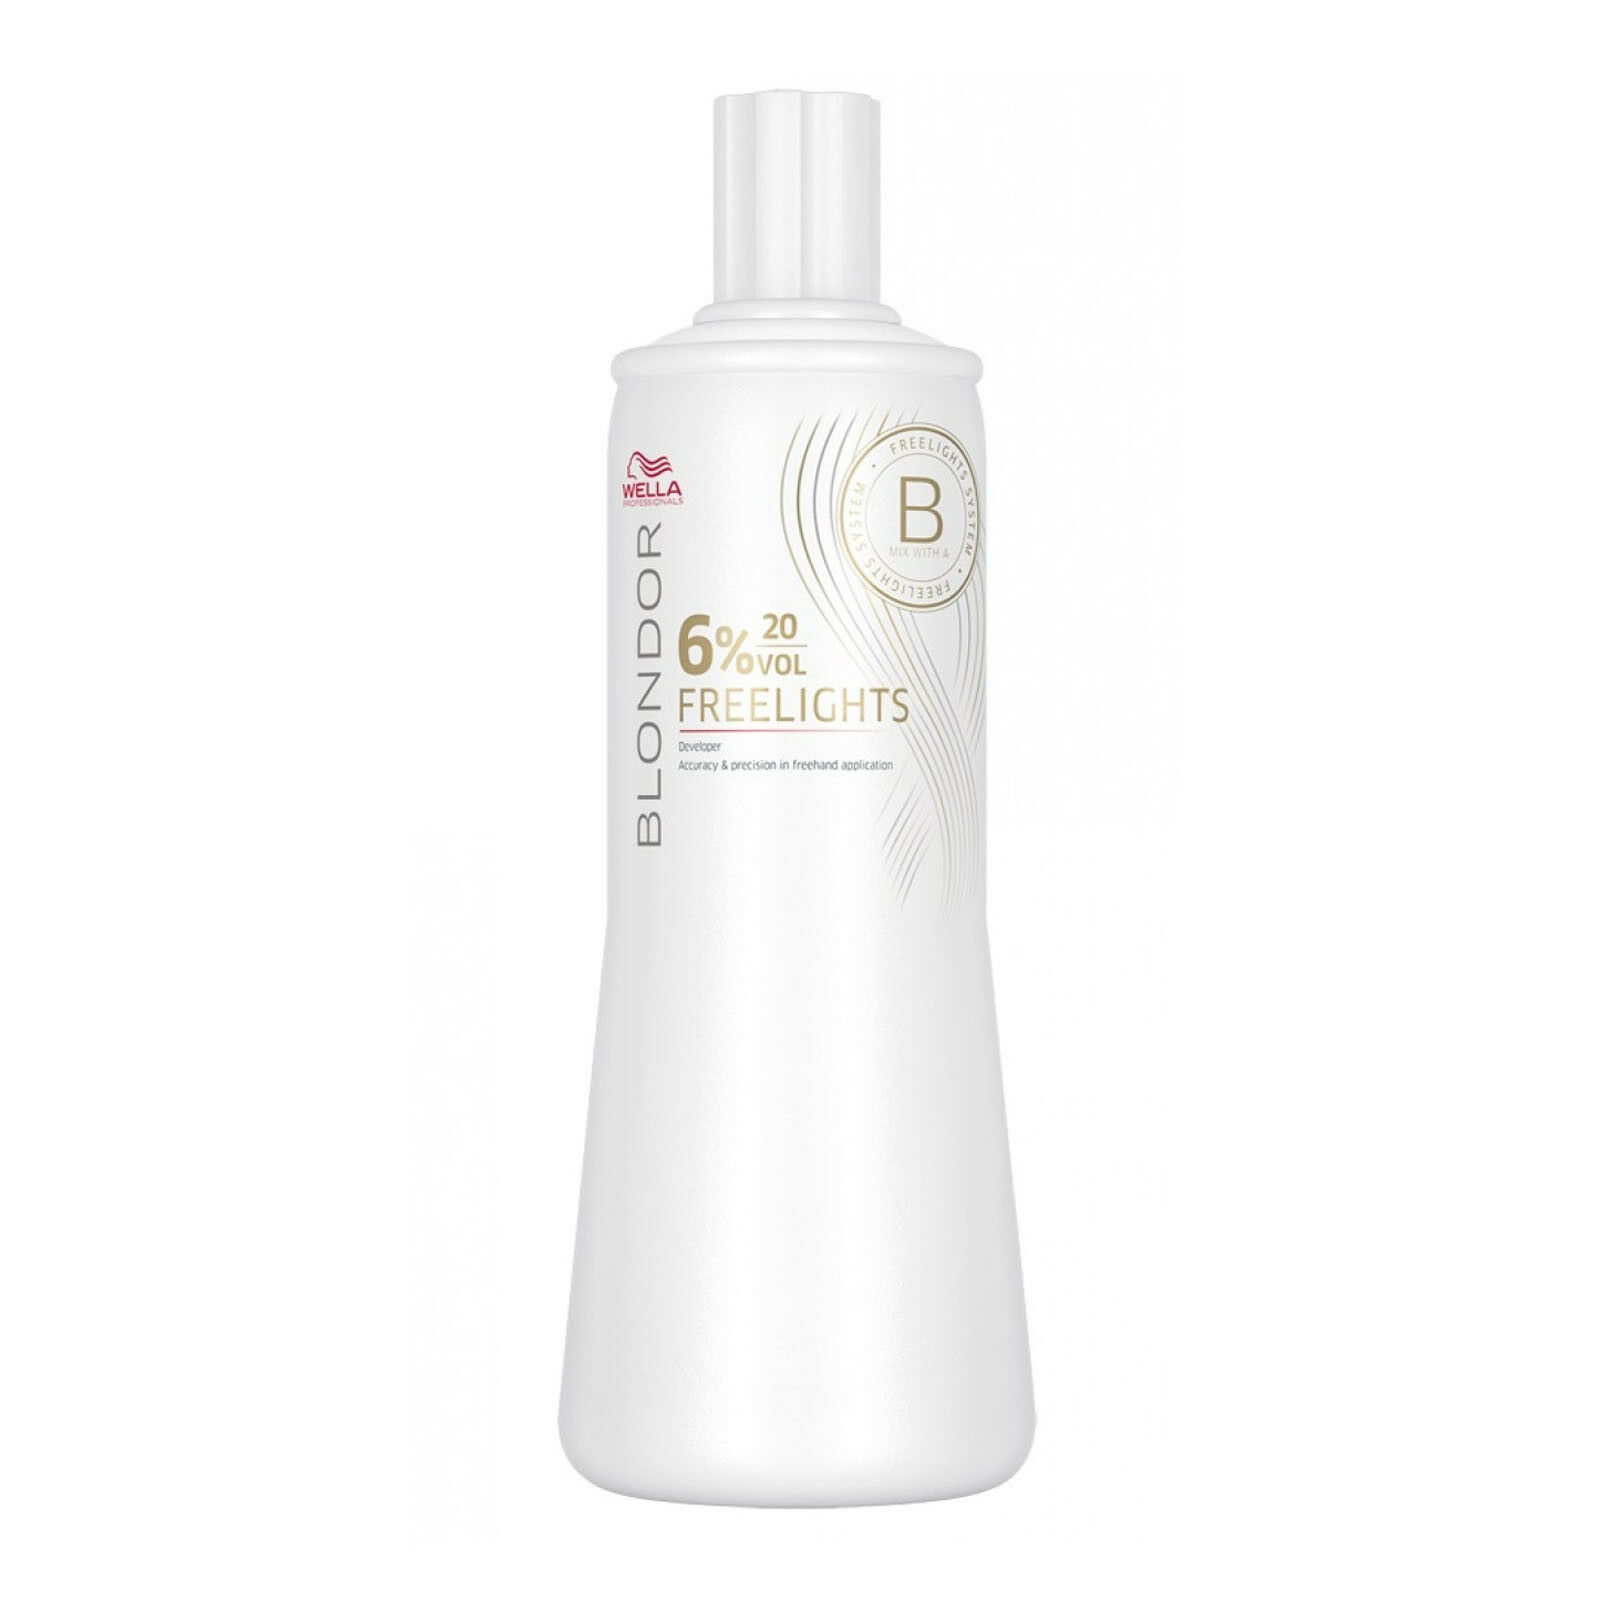 Wella Blondor Freelights Oxydant Entwickler Emulsion Oxidations Creme 6% 1000 ml